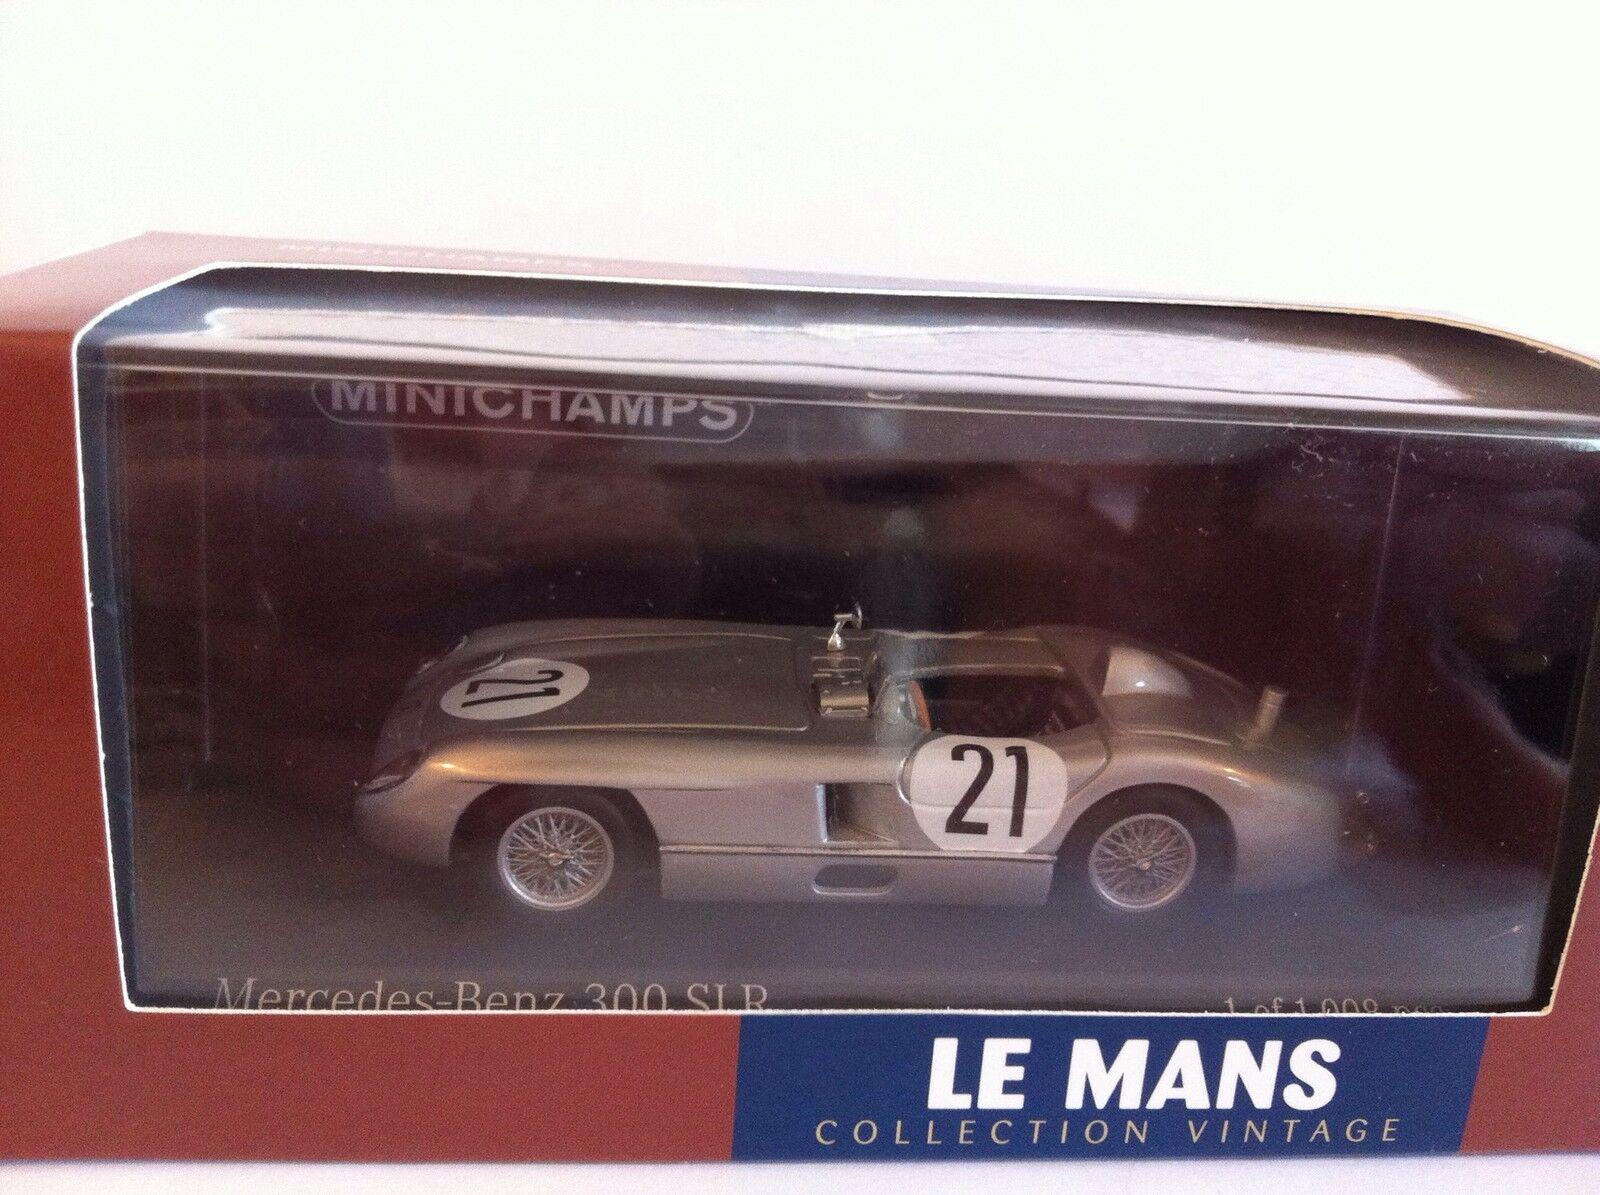 Minichamps 1 43 Escala Mercedes 300 SLR Rey Simon Le Mans 1955 432553021 Nuevo